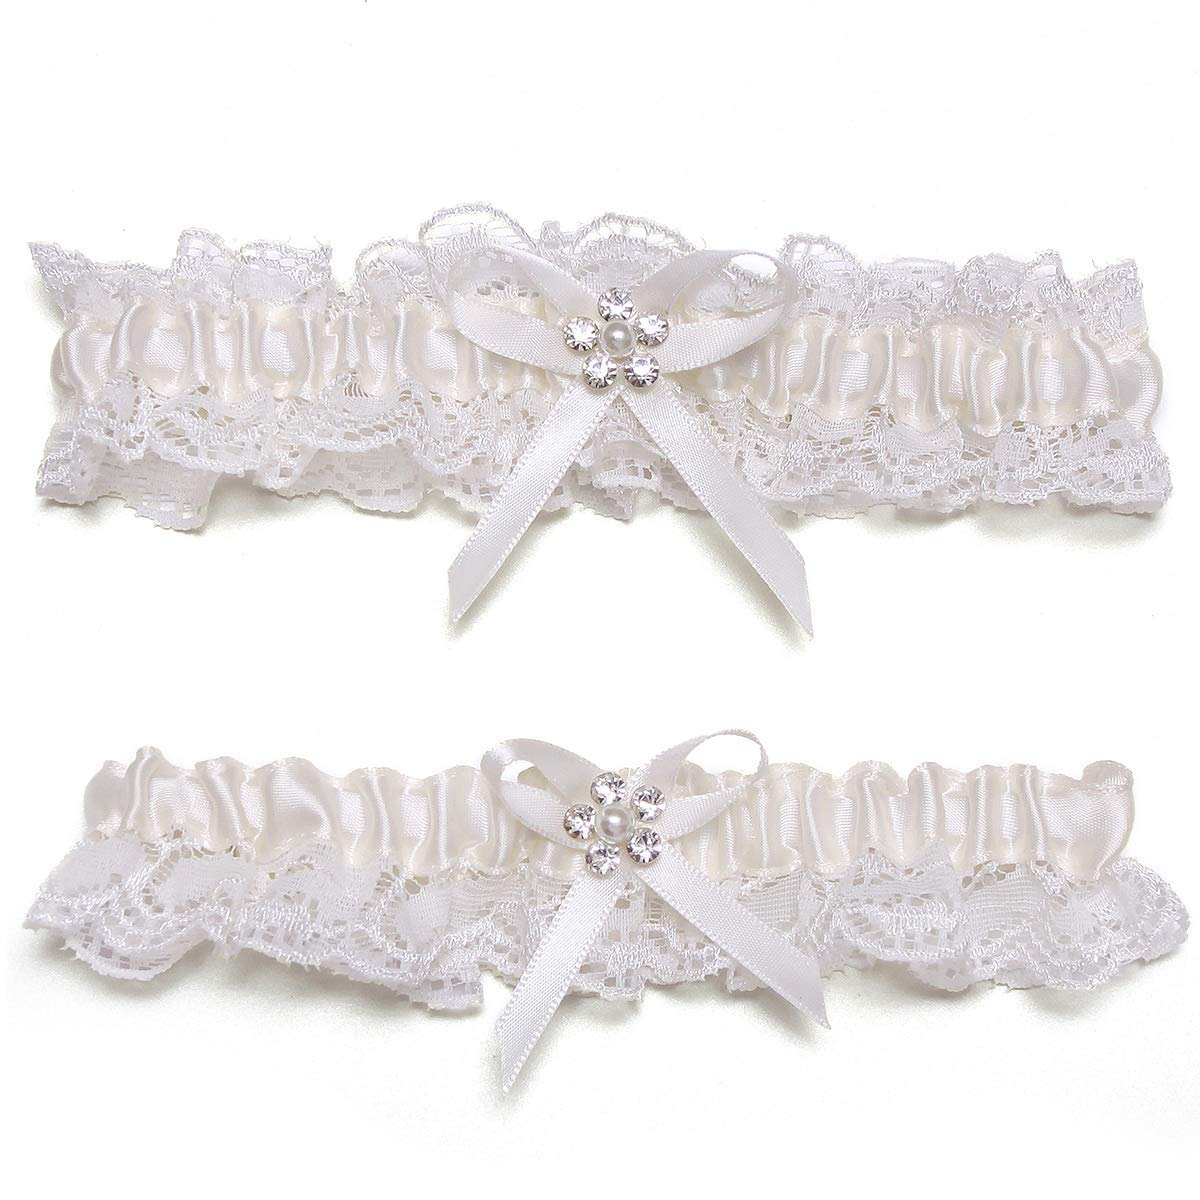 Plus Size Wedding Garters: Buy High Waist Garters Plus Size XL Garter Belt Female